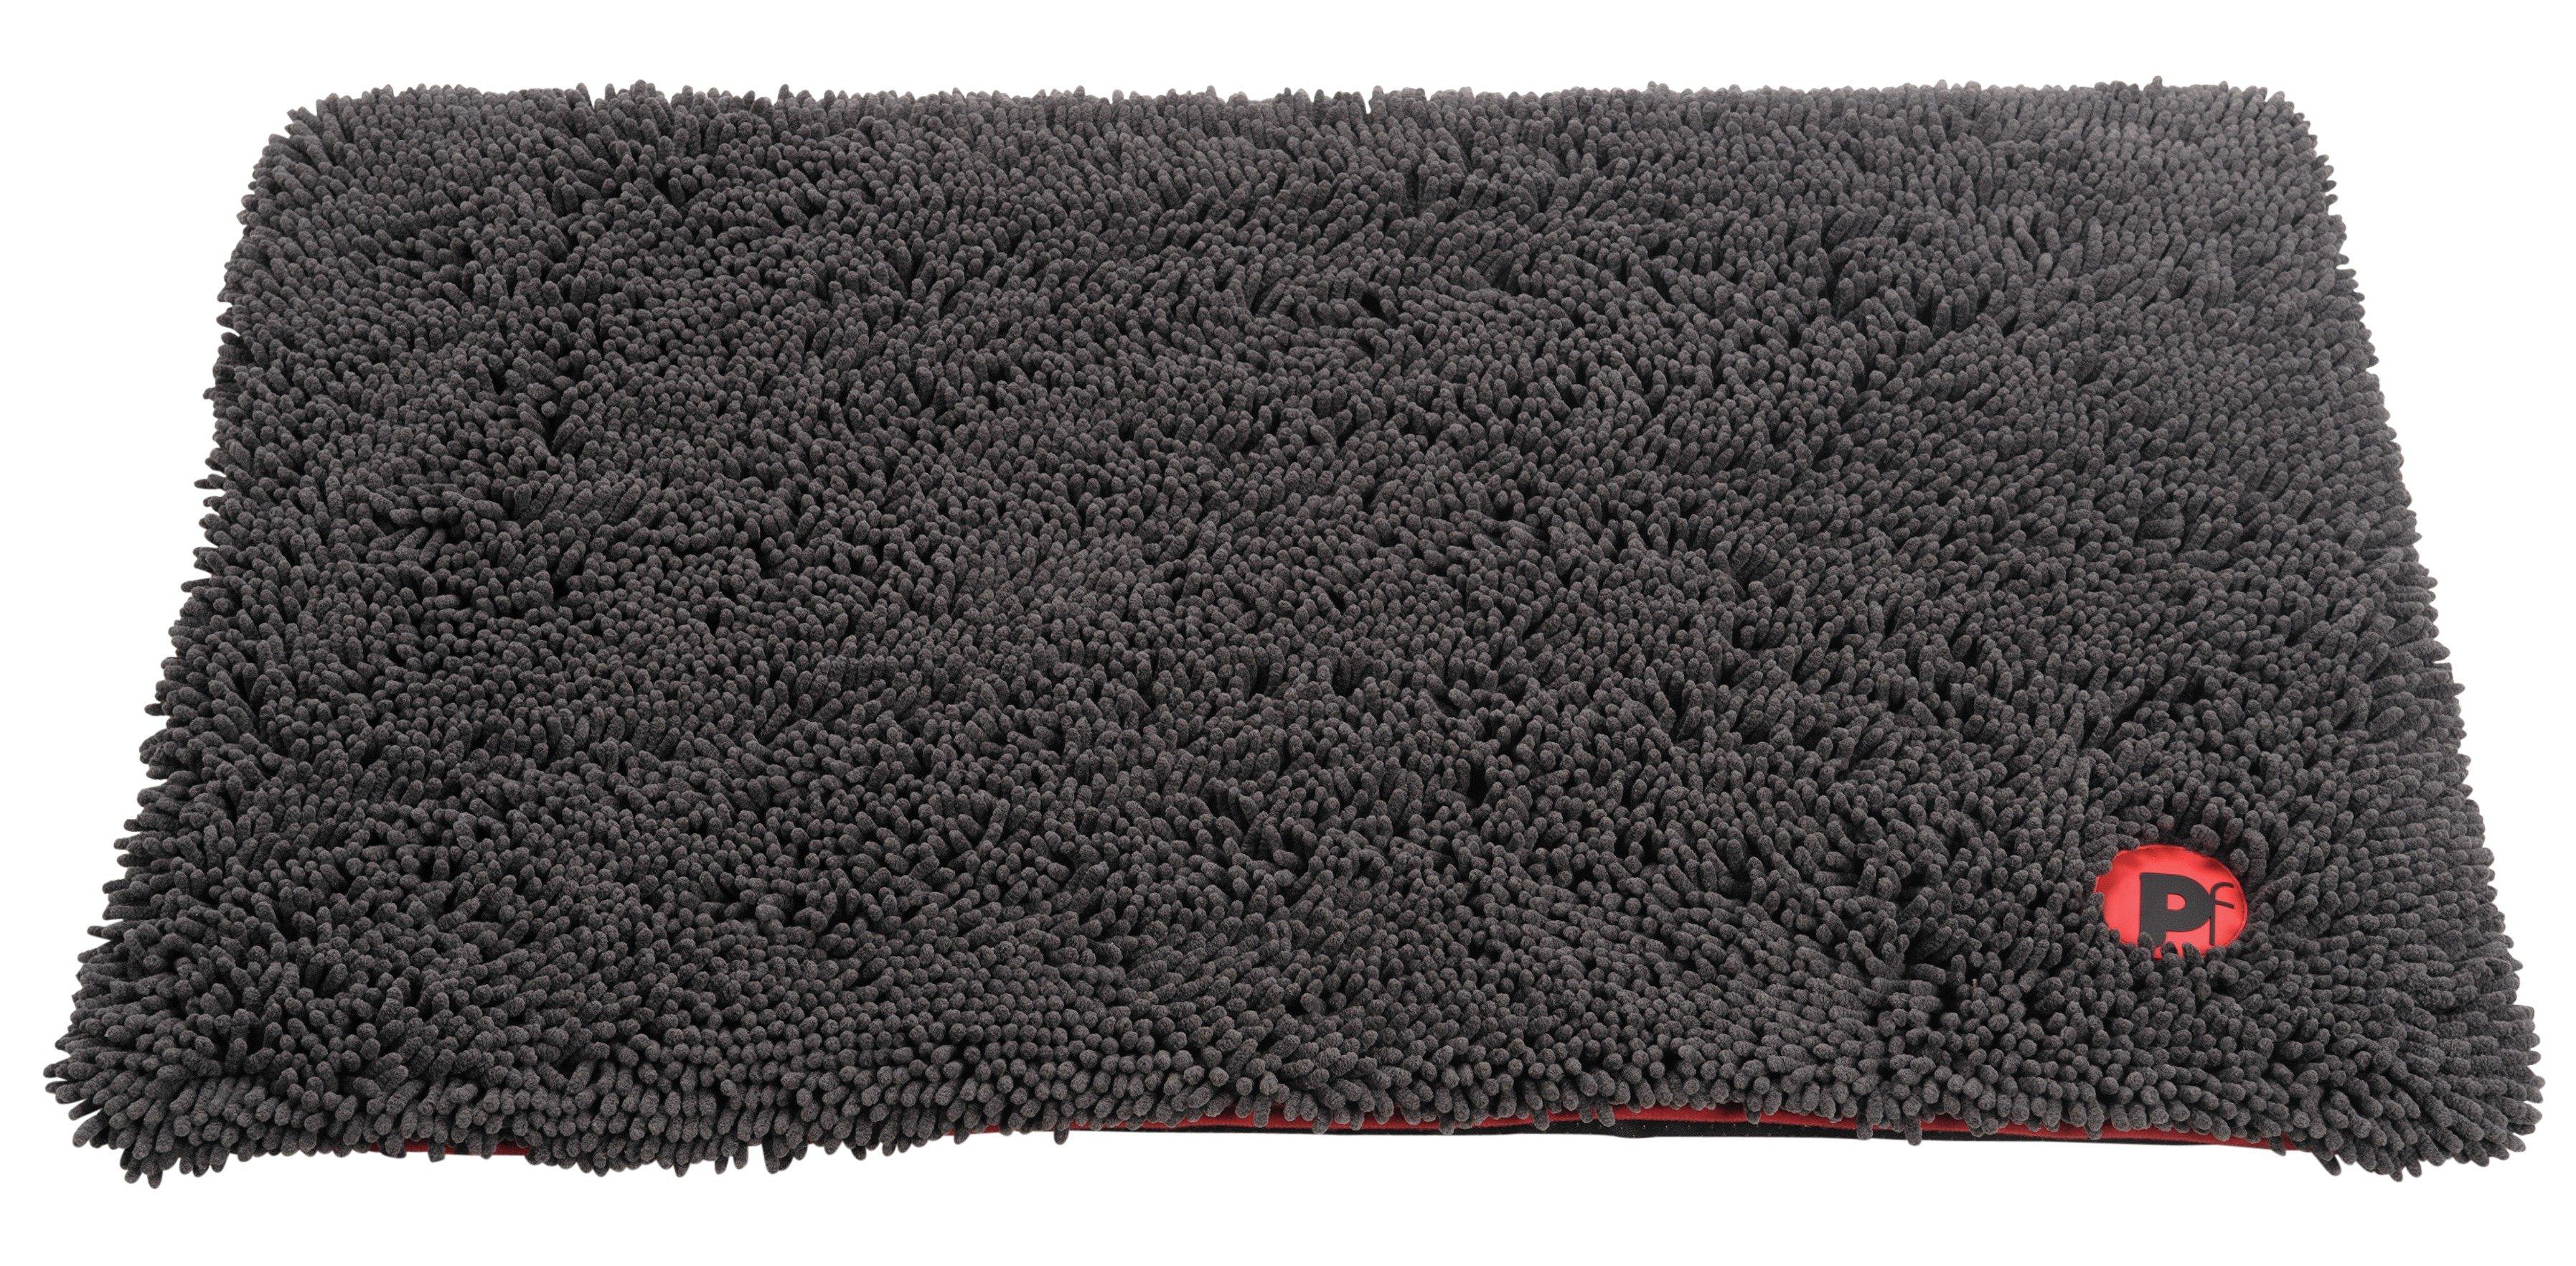 Petface Memory Foam Microfibre Dog Crate Mat - Large